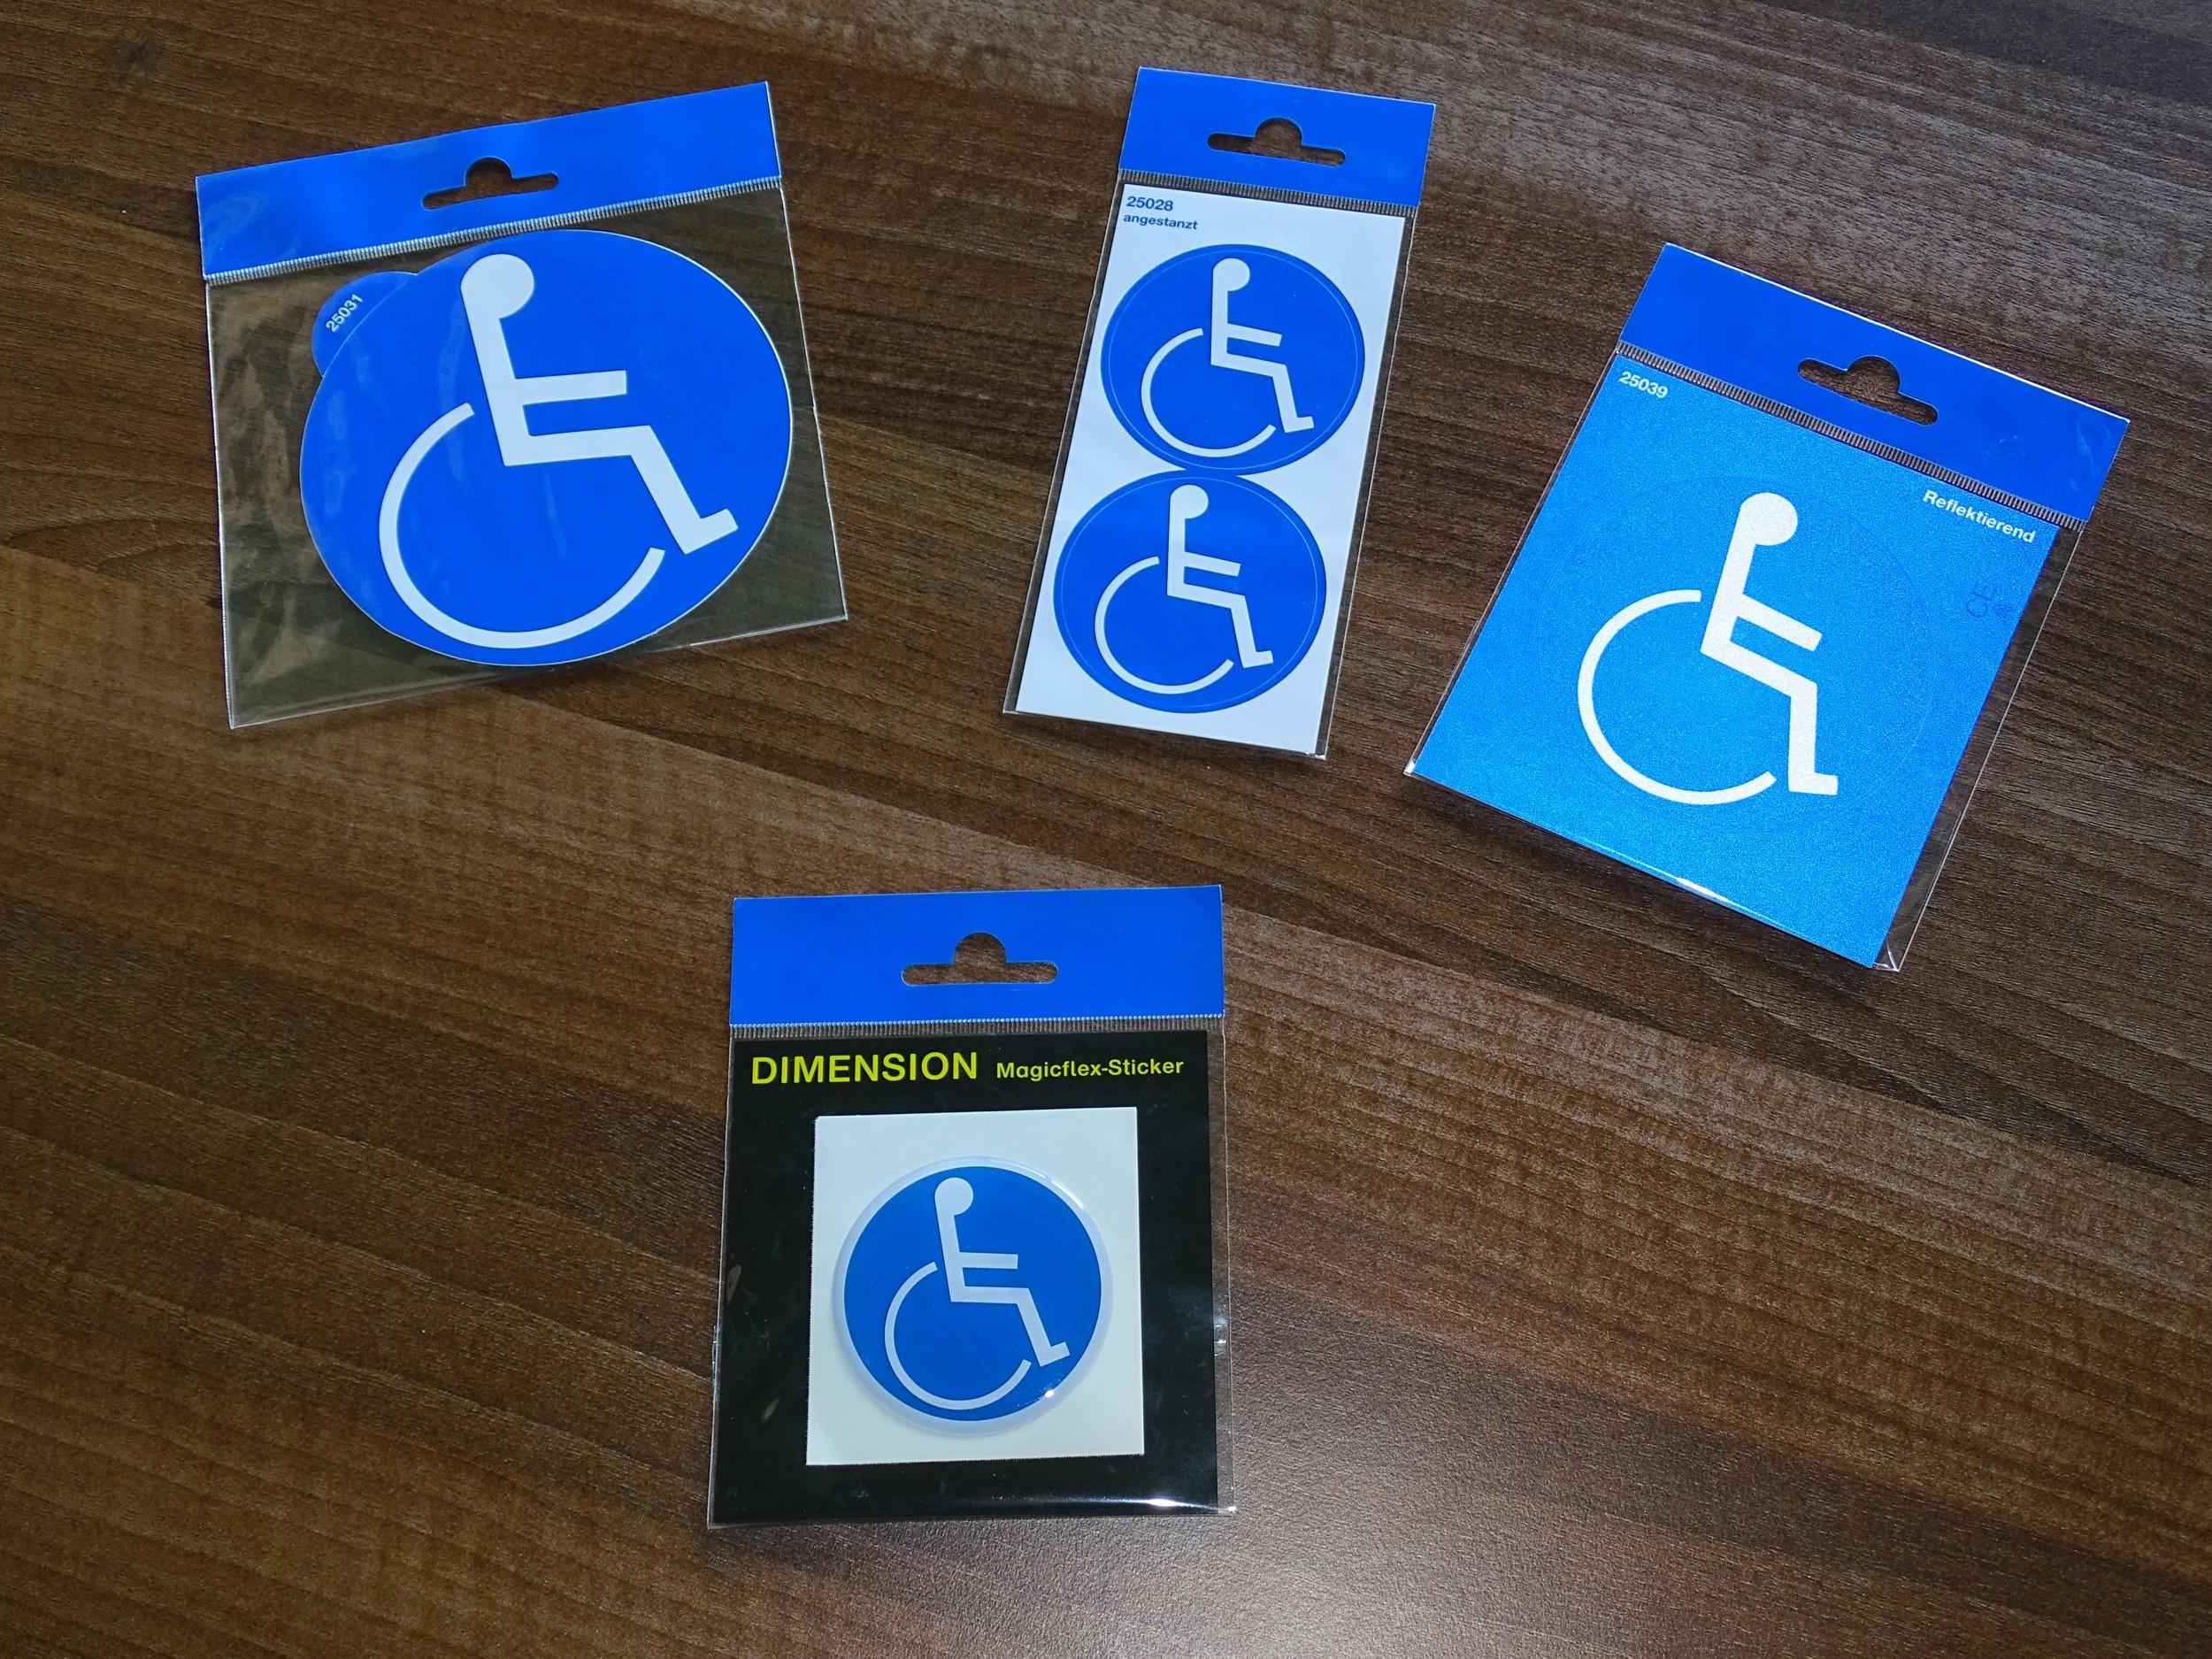 Sticker handicapped symbol blue reflective – Bild 3